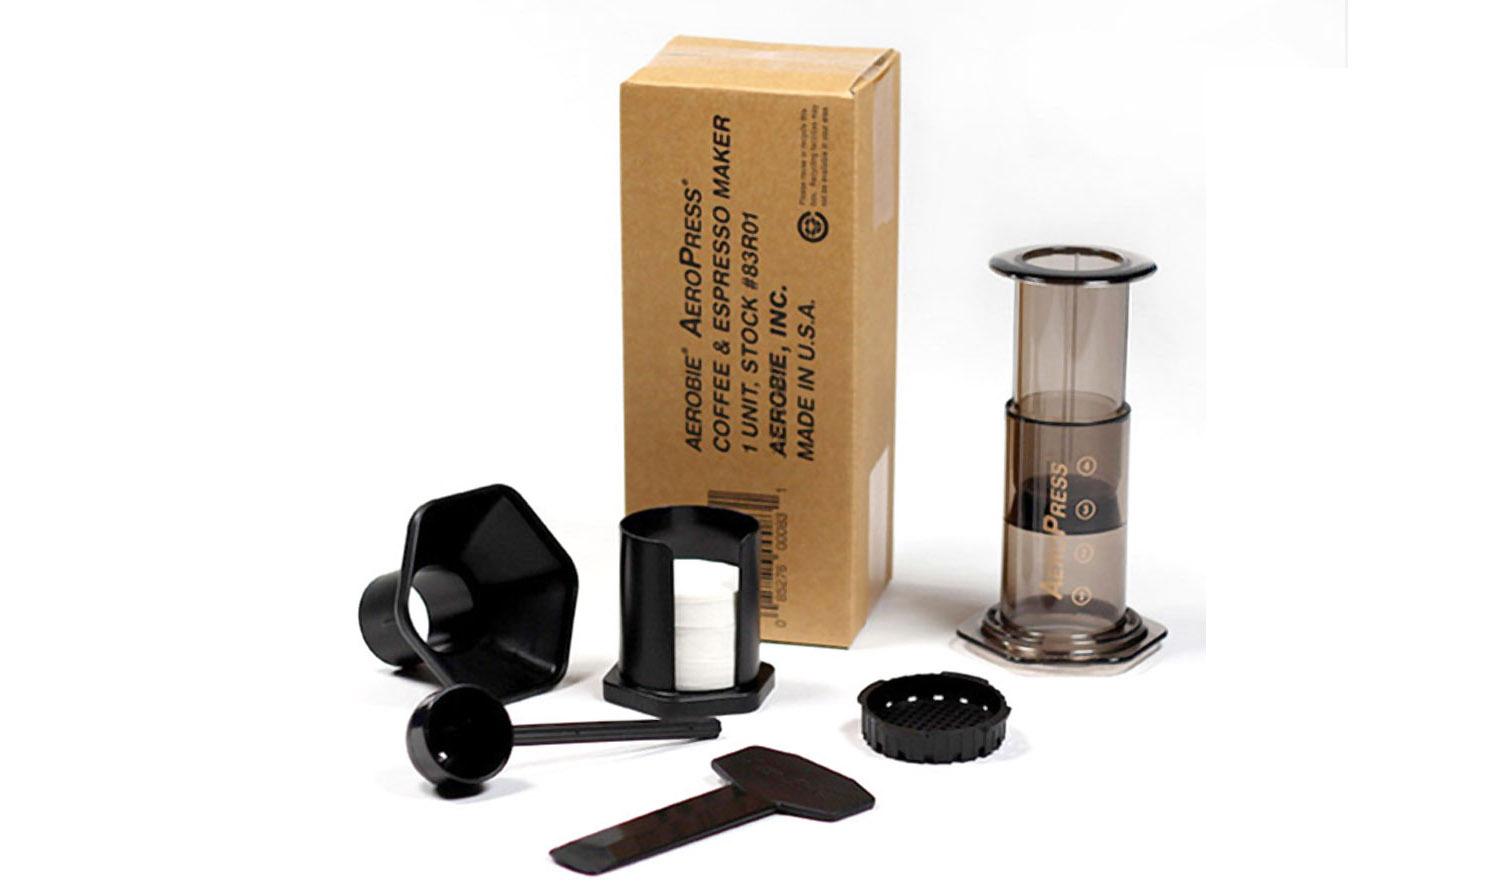 Favorite Aeropress Making Coffee Outdoors Camping Coffee Pot Rei Camping Coffee Pot Set curbed Camping Coffee Pot